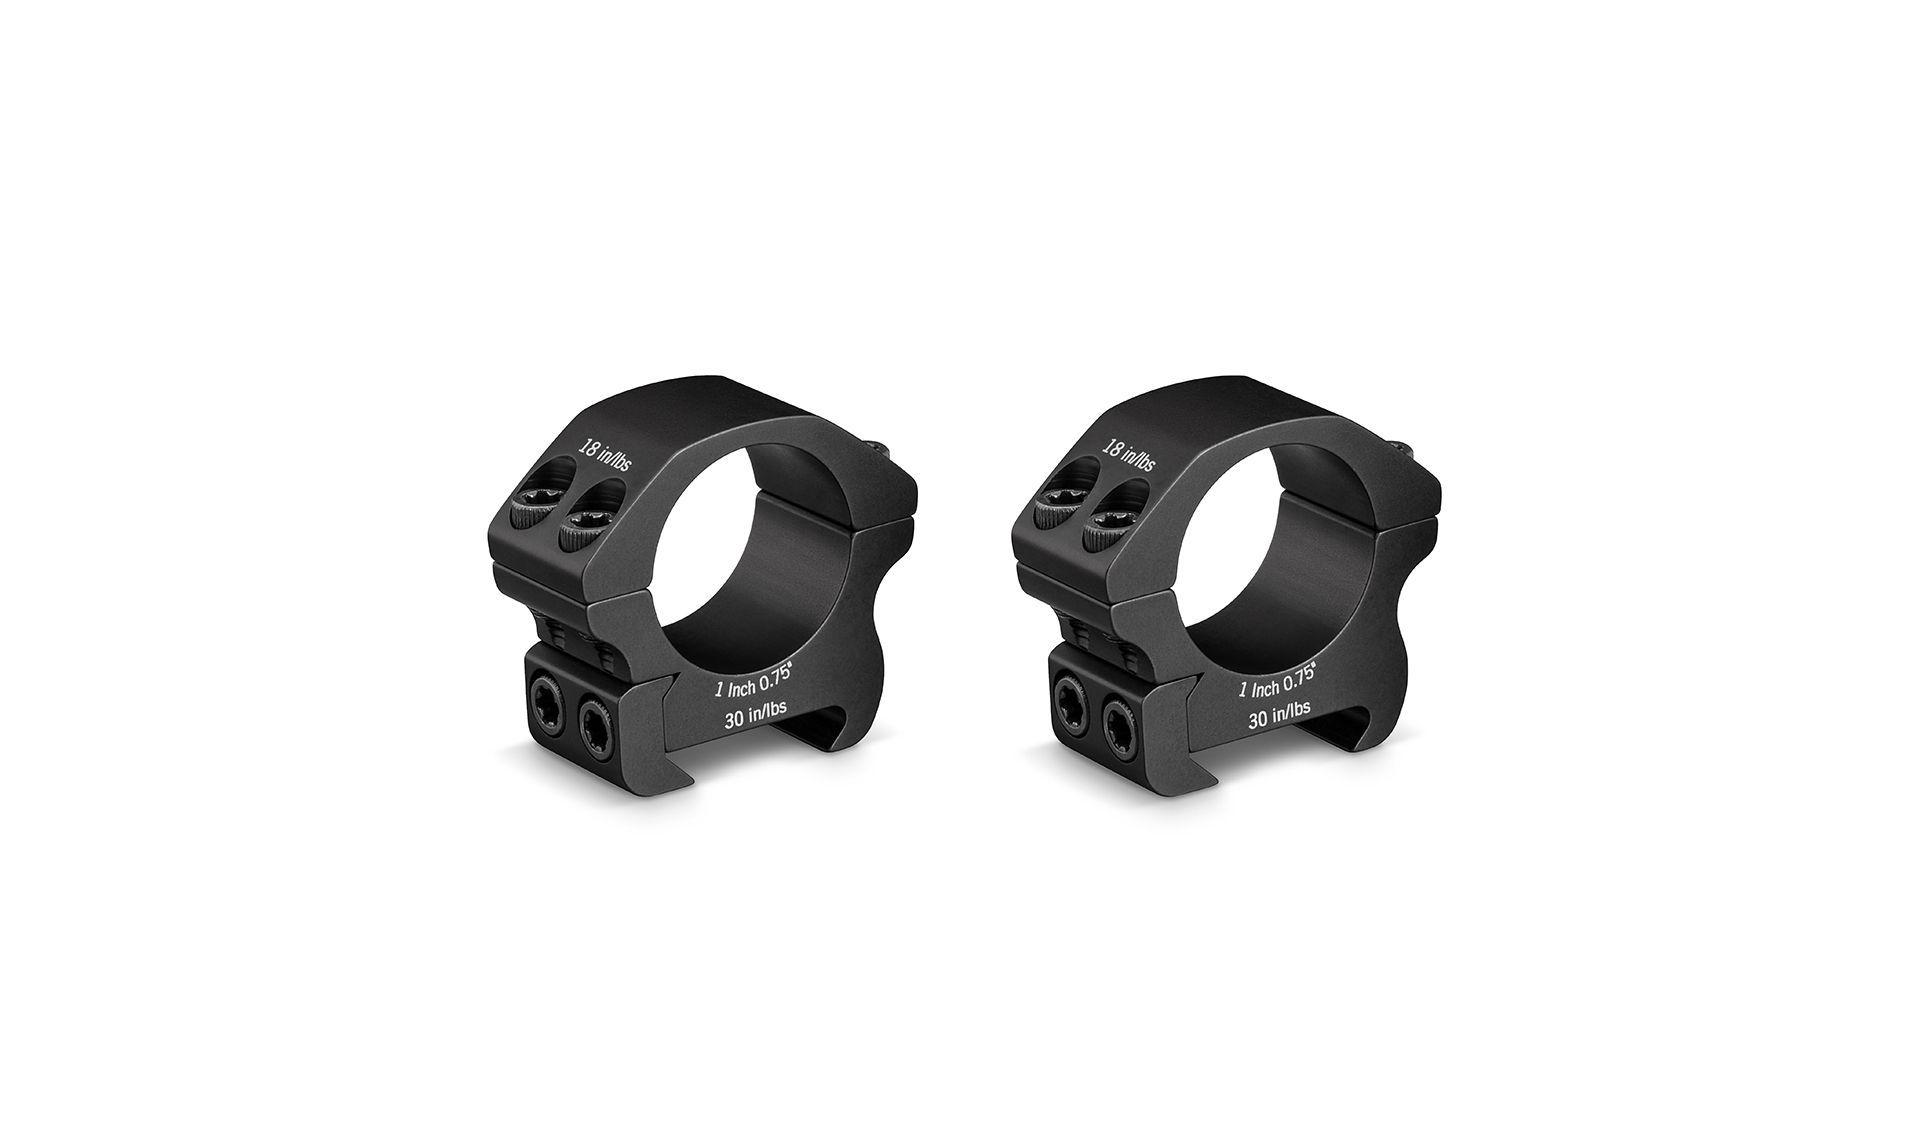 Vortex Pro Series Picatinny Scope Rings - Australian Tactical Precision